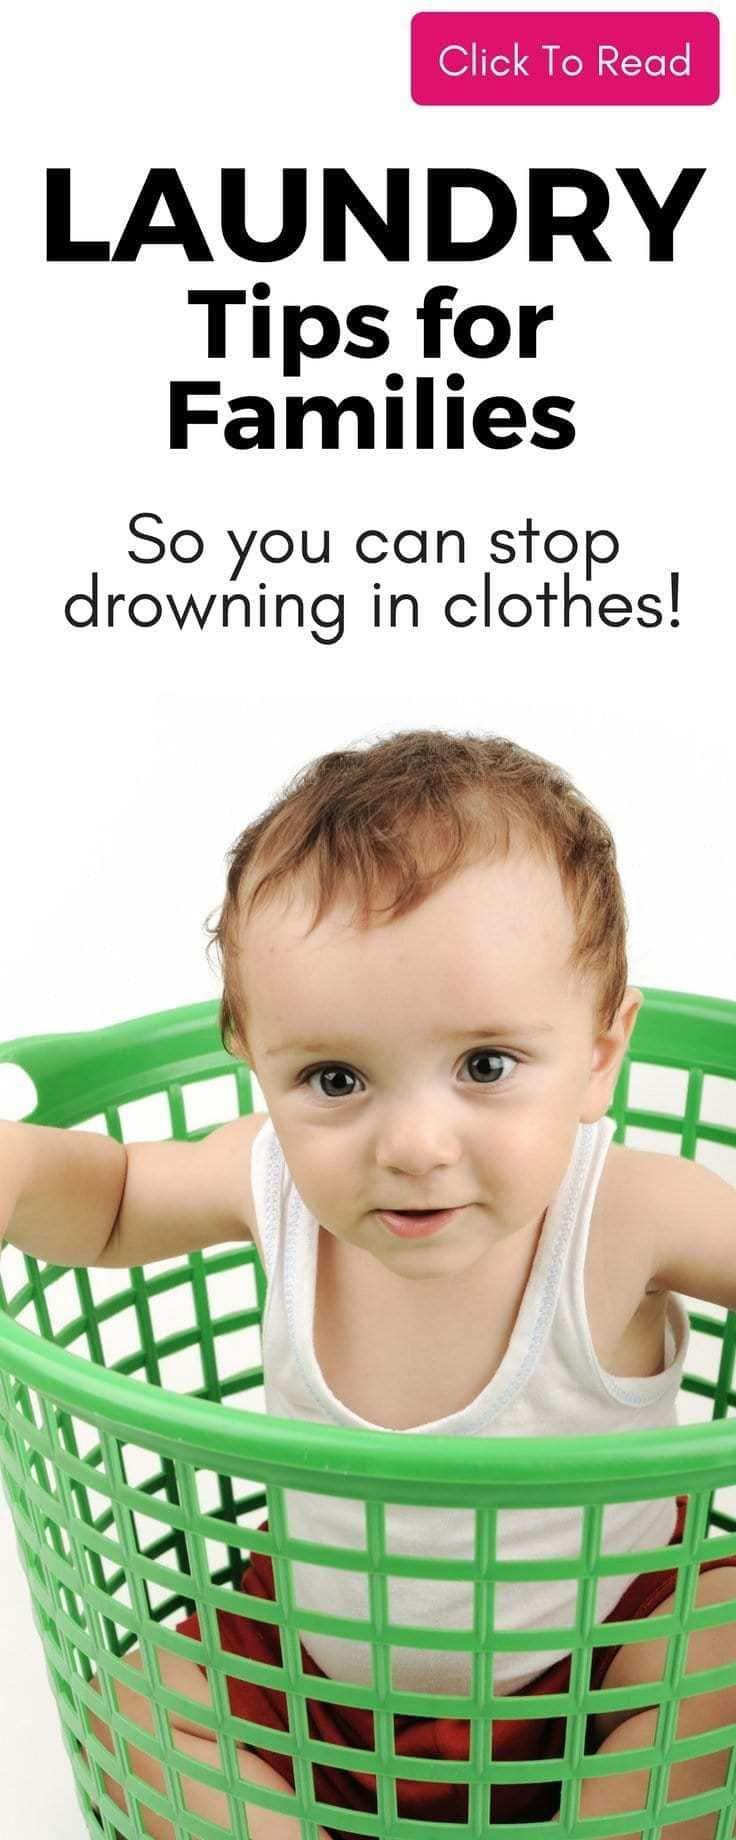 Easy laundry tips to help you wash clothes if you have a big family ! #laundry #laundrytips #washclothes #laundryday #drowninginlaundry